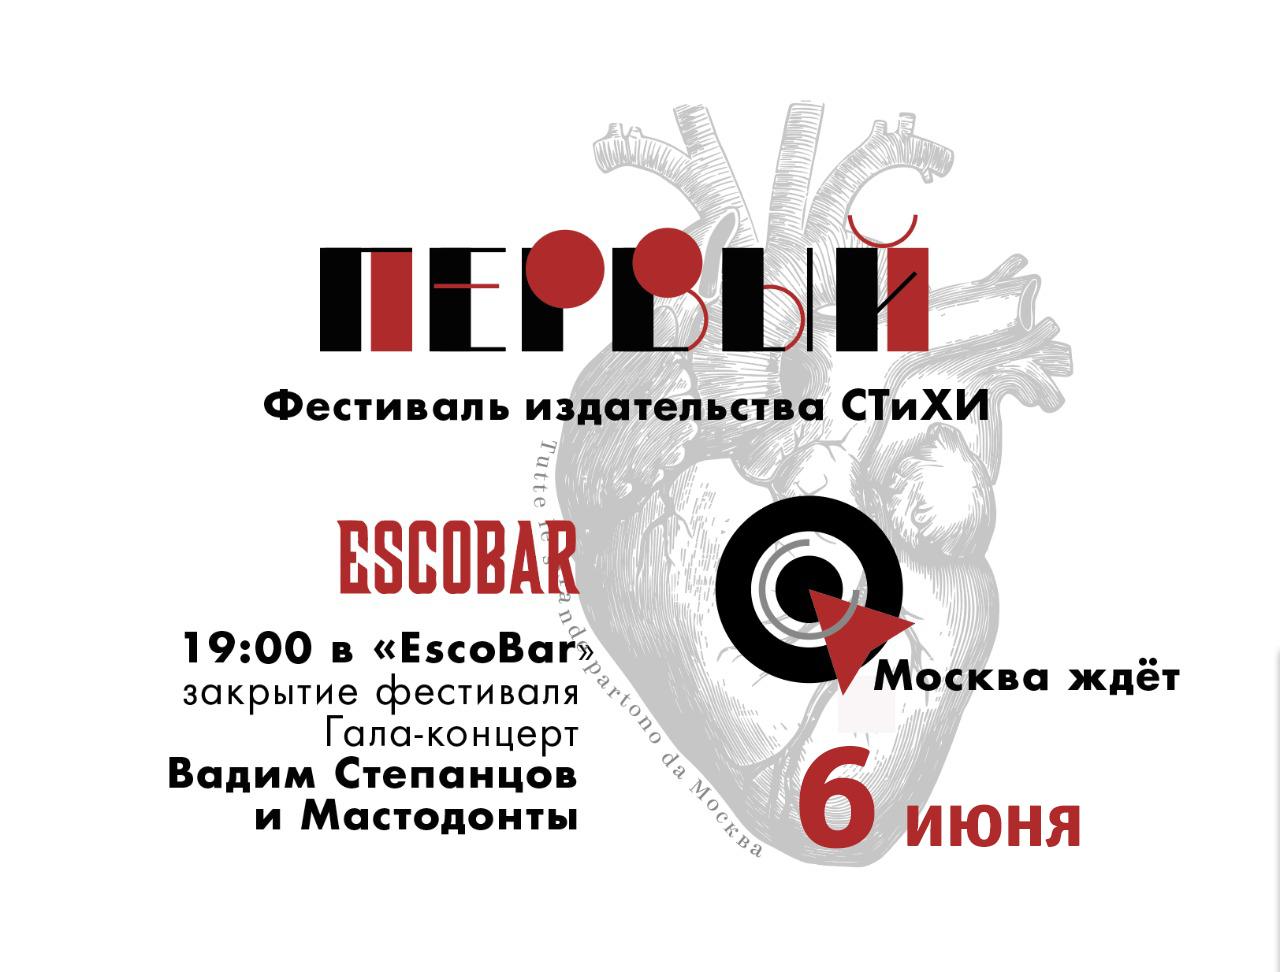 Вадим Степанцов и Мастодонты